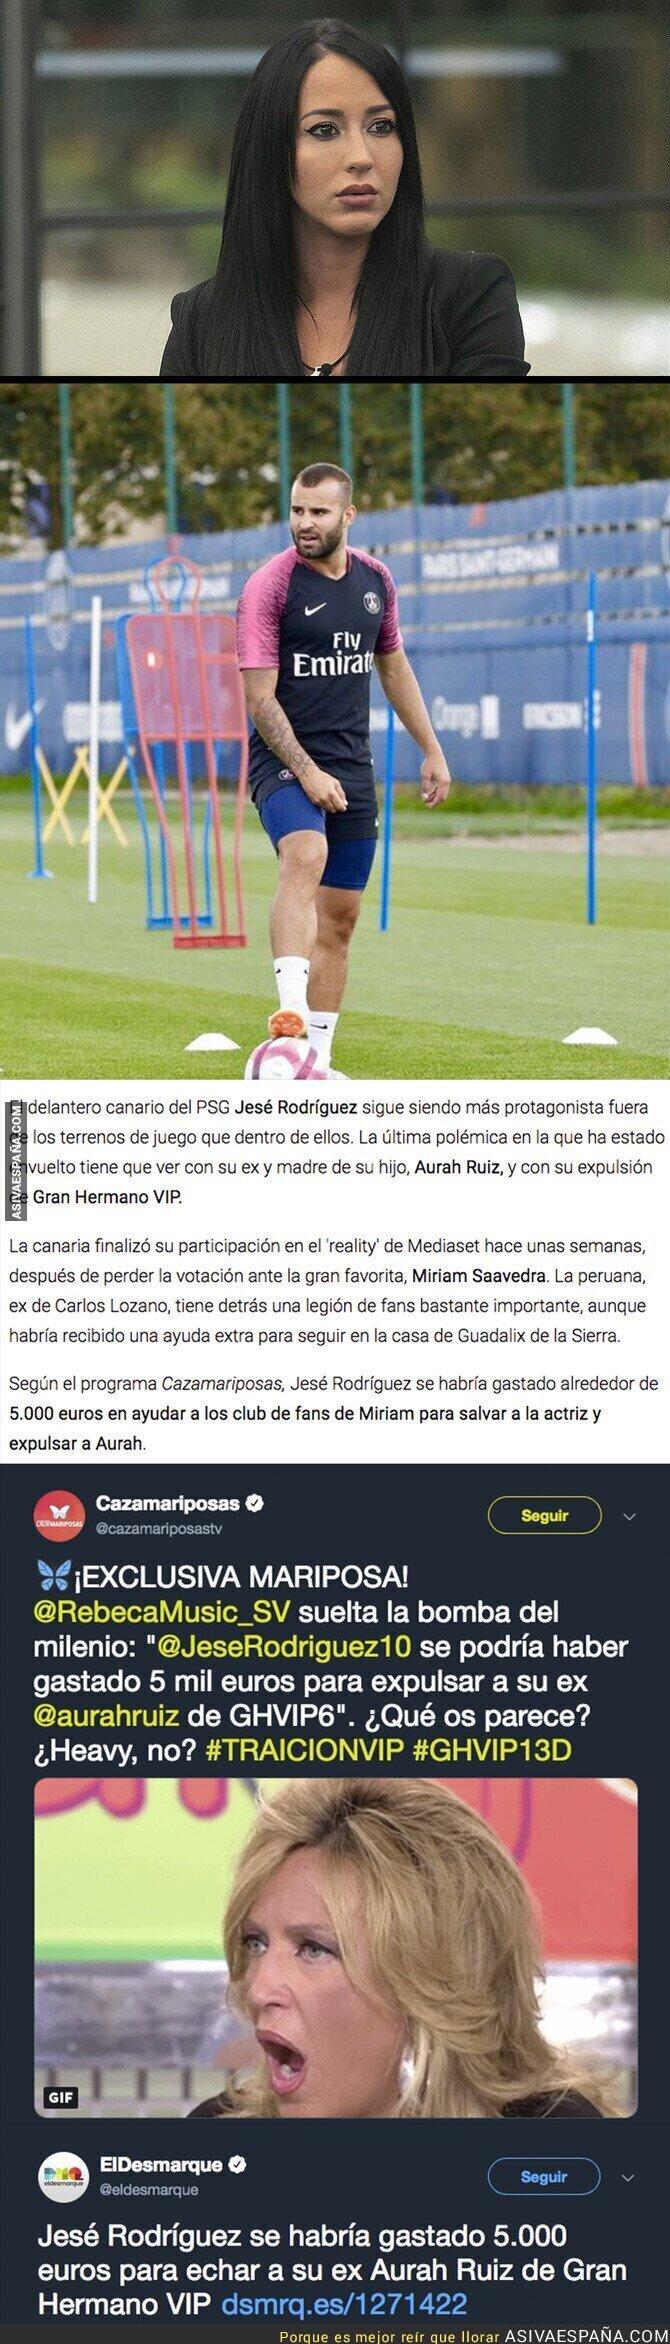 100835 - La brutal cantidad de dinero que se dejó Jesé Rodríguez para echar a Aurah de GH VIP